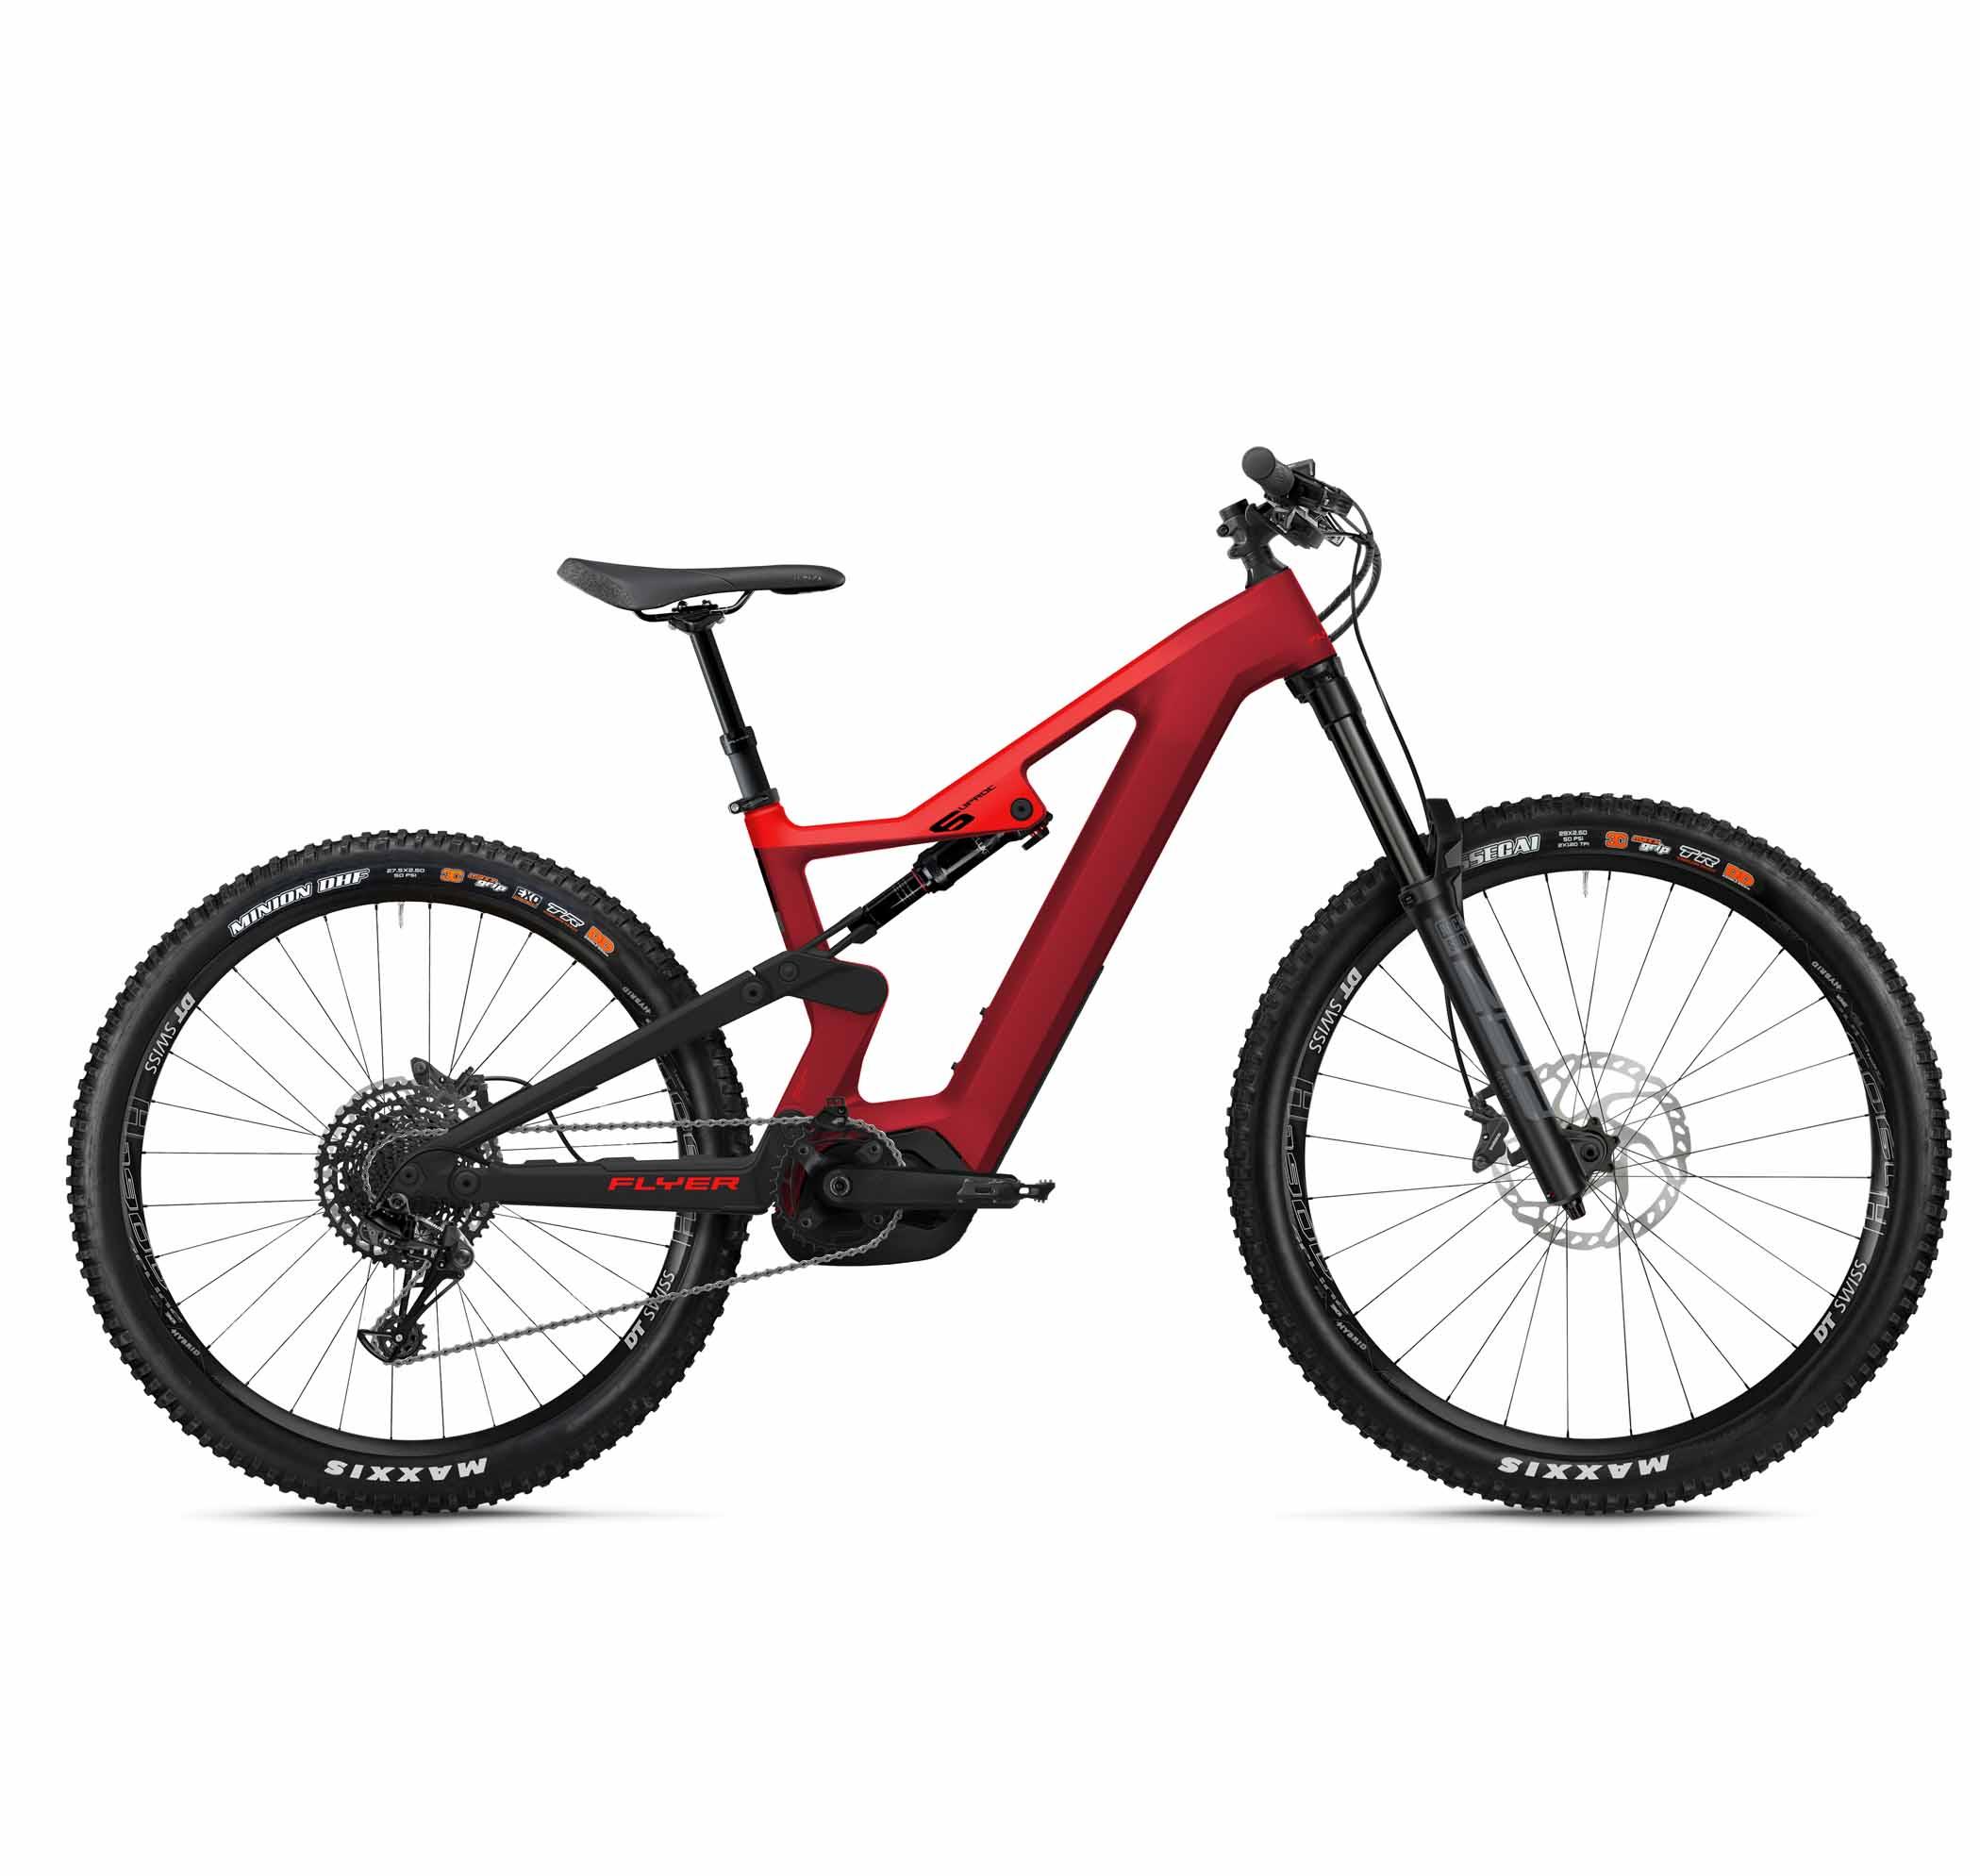 Flyer_Rodeo_Bike_Uproc_6